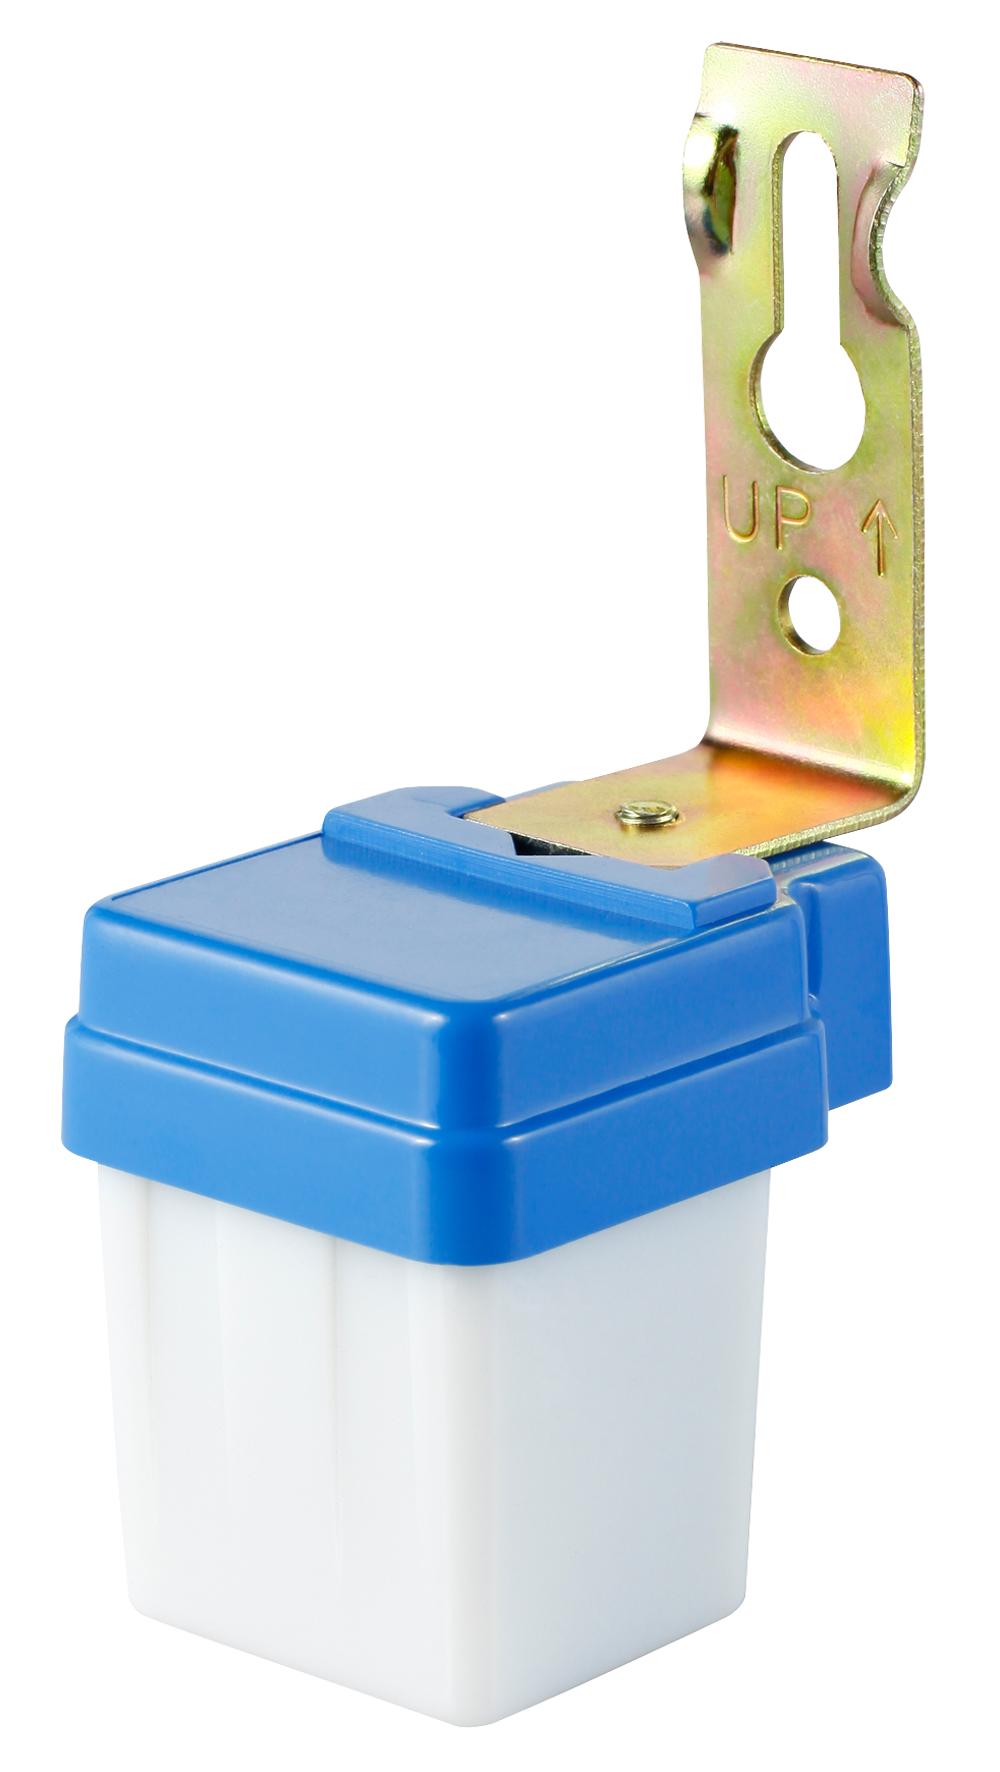 Dämmerungsschalter McShine ''midi'', 230V/6A